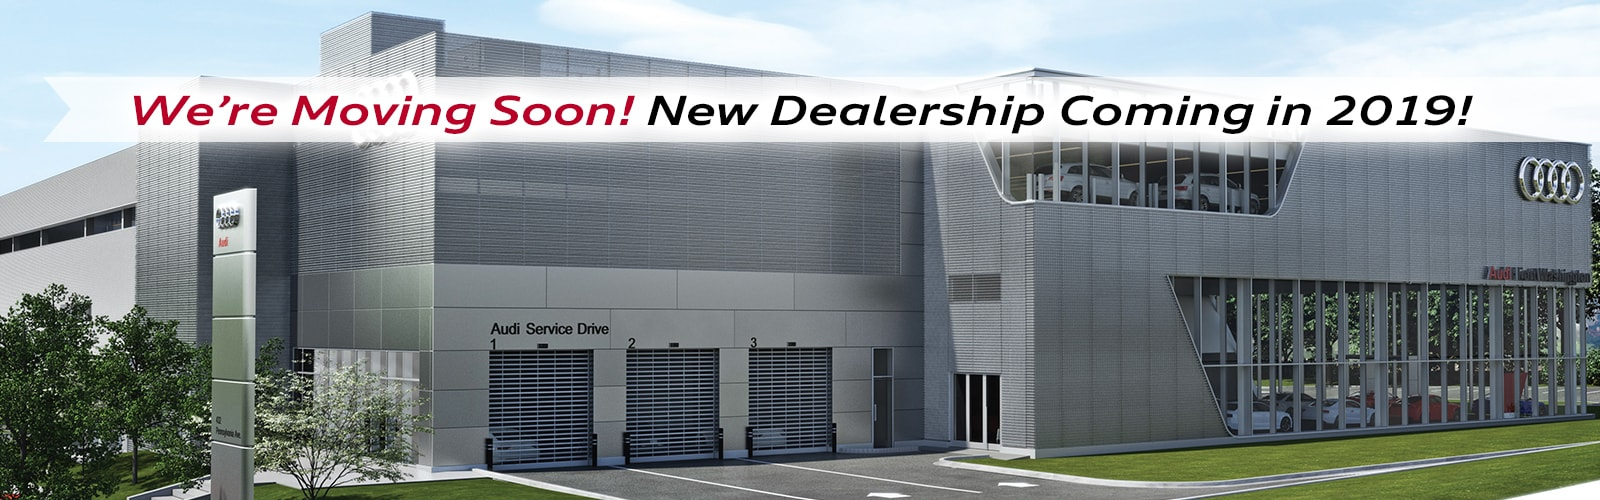 Audi Willow Grove New Audi Dealership In Willow Grove PA - Audi dealer